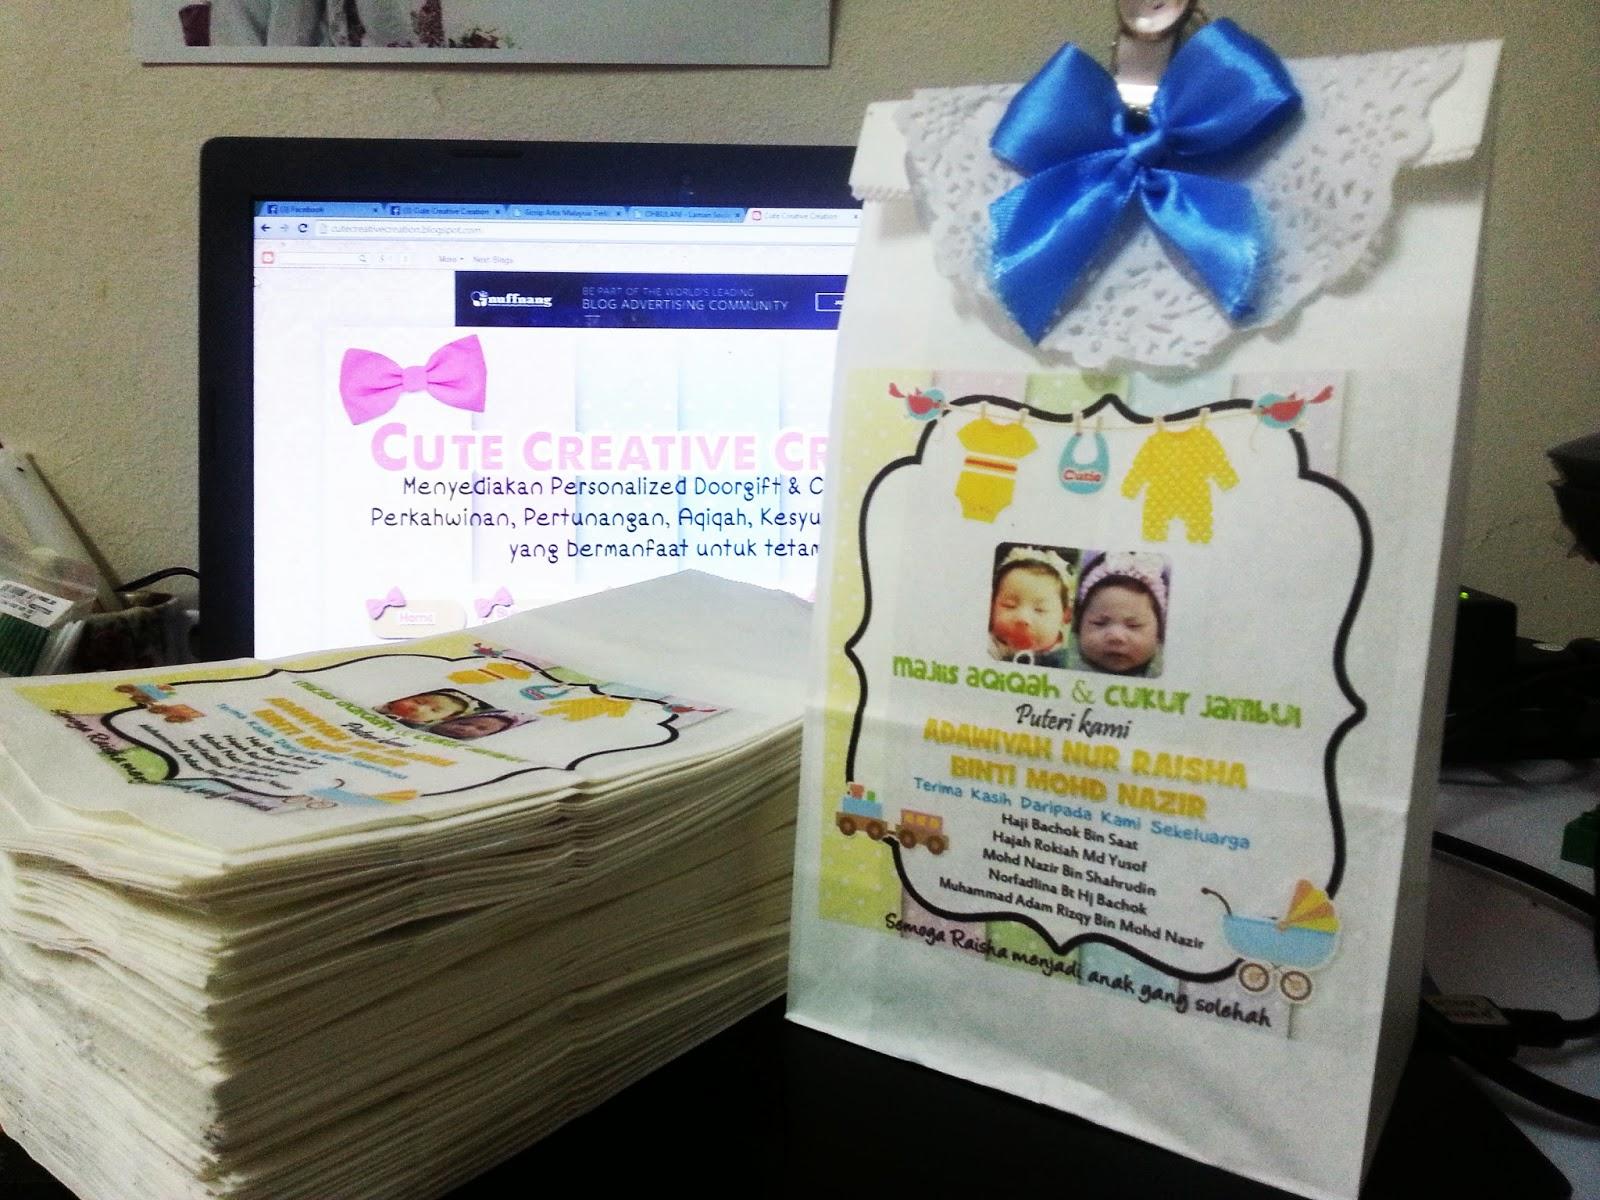 Paper bag utk doorgift joy studio design gallery best for Idea doorgift untuk aqiqah